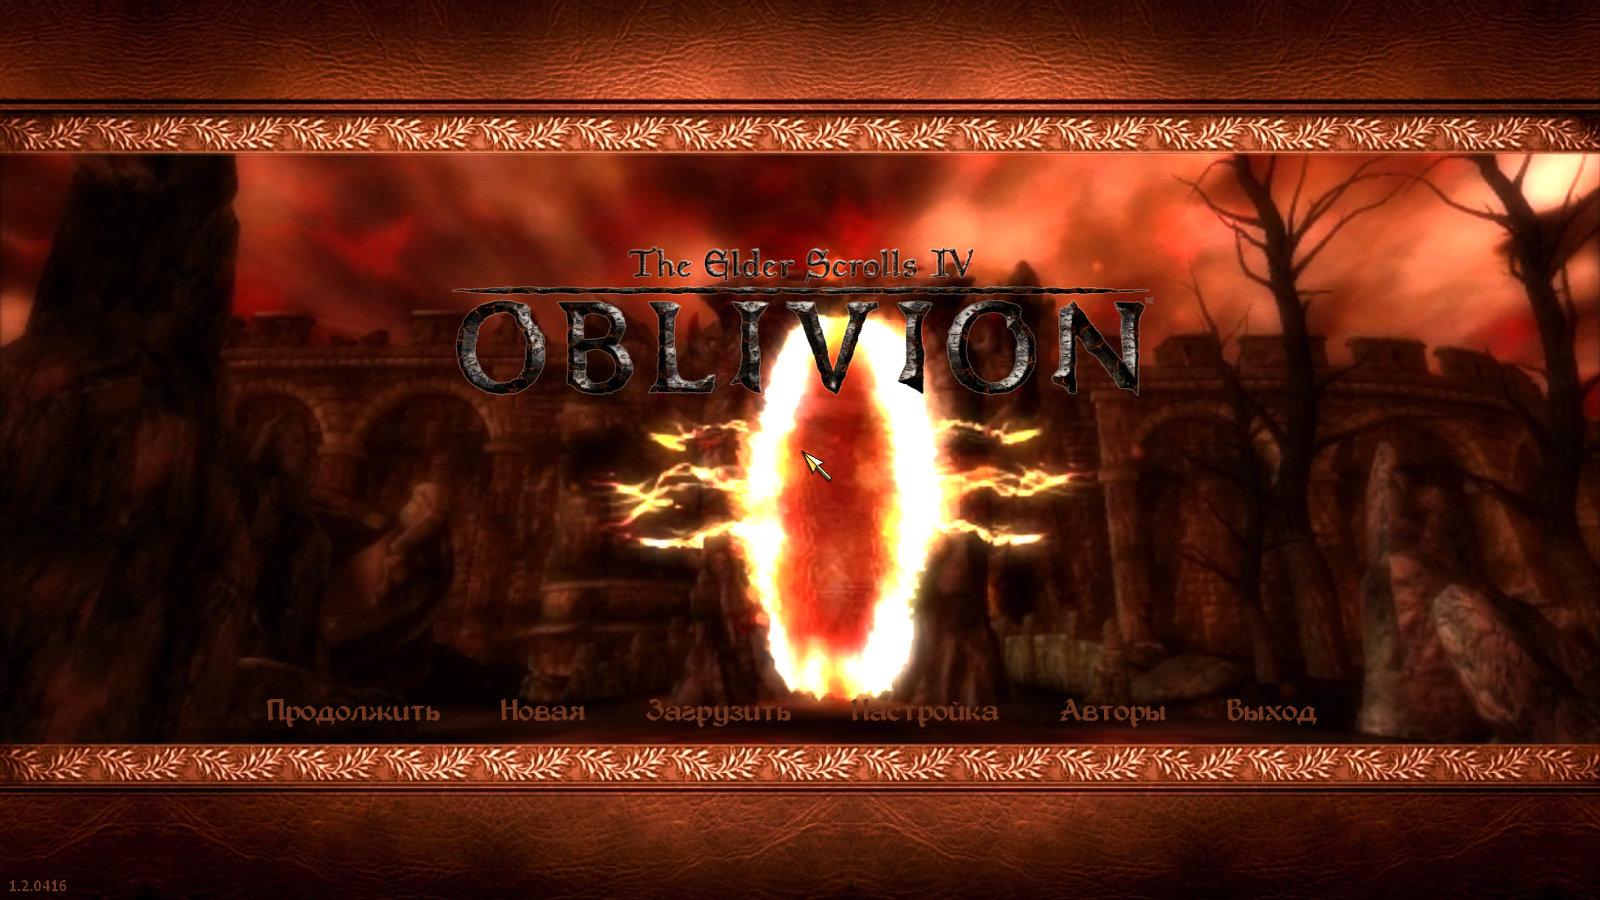 The elder scrolls iv: oblivion - perfect (ex gbrs edition) скачать торрент